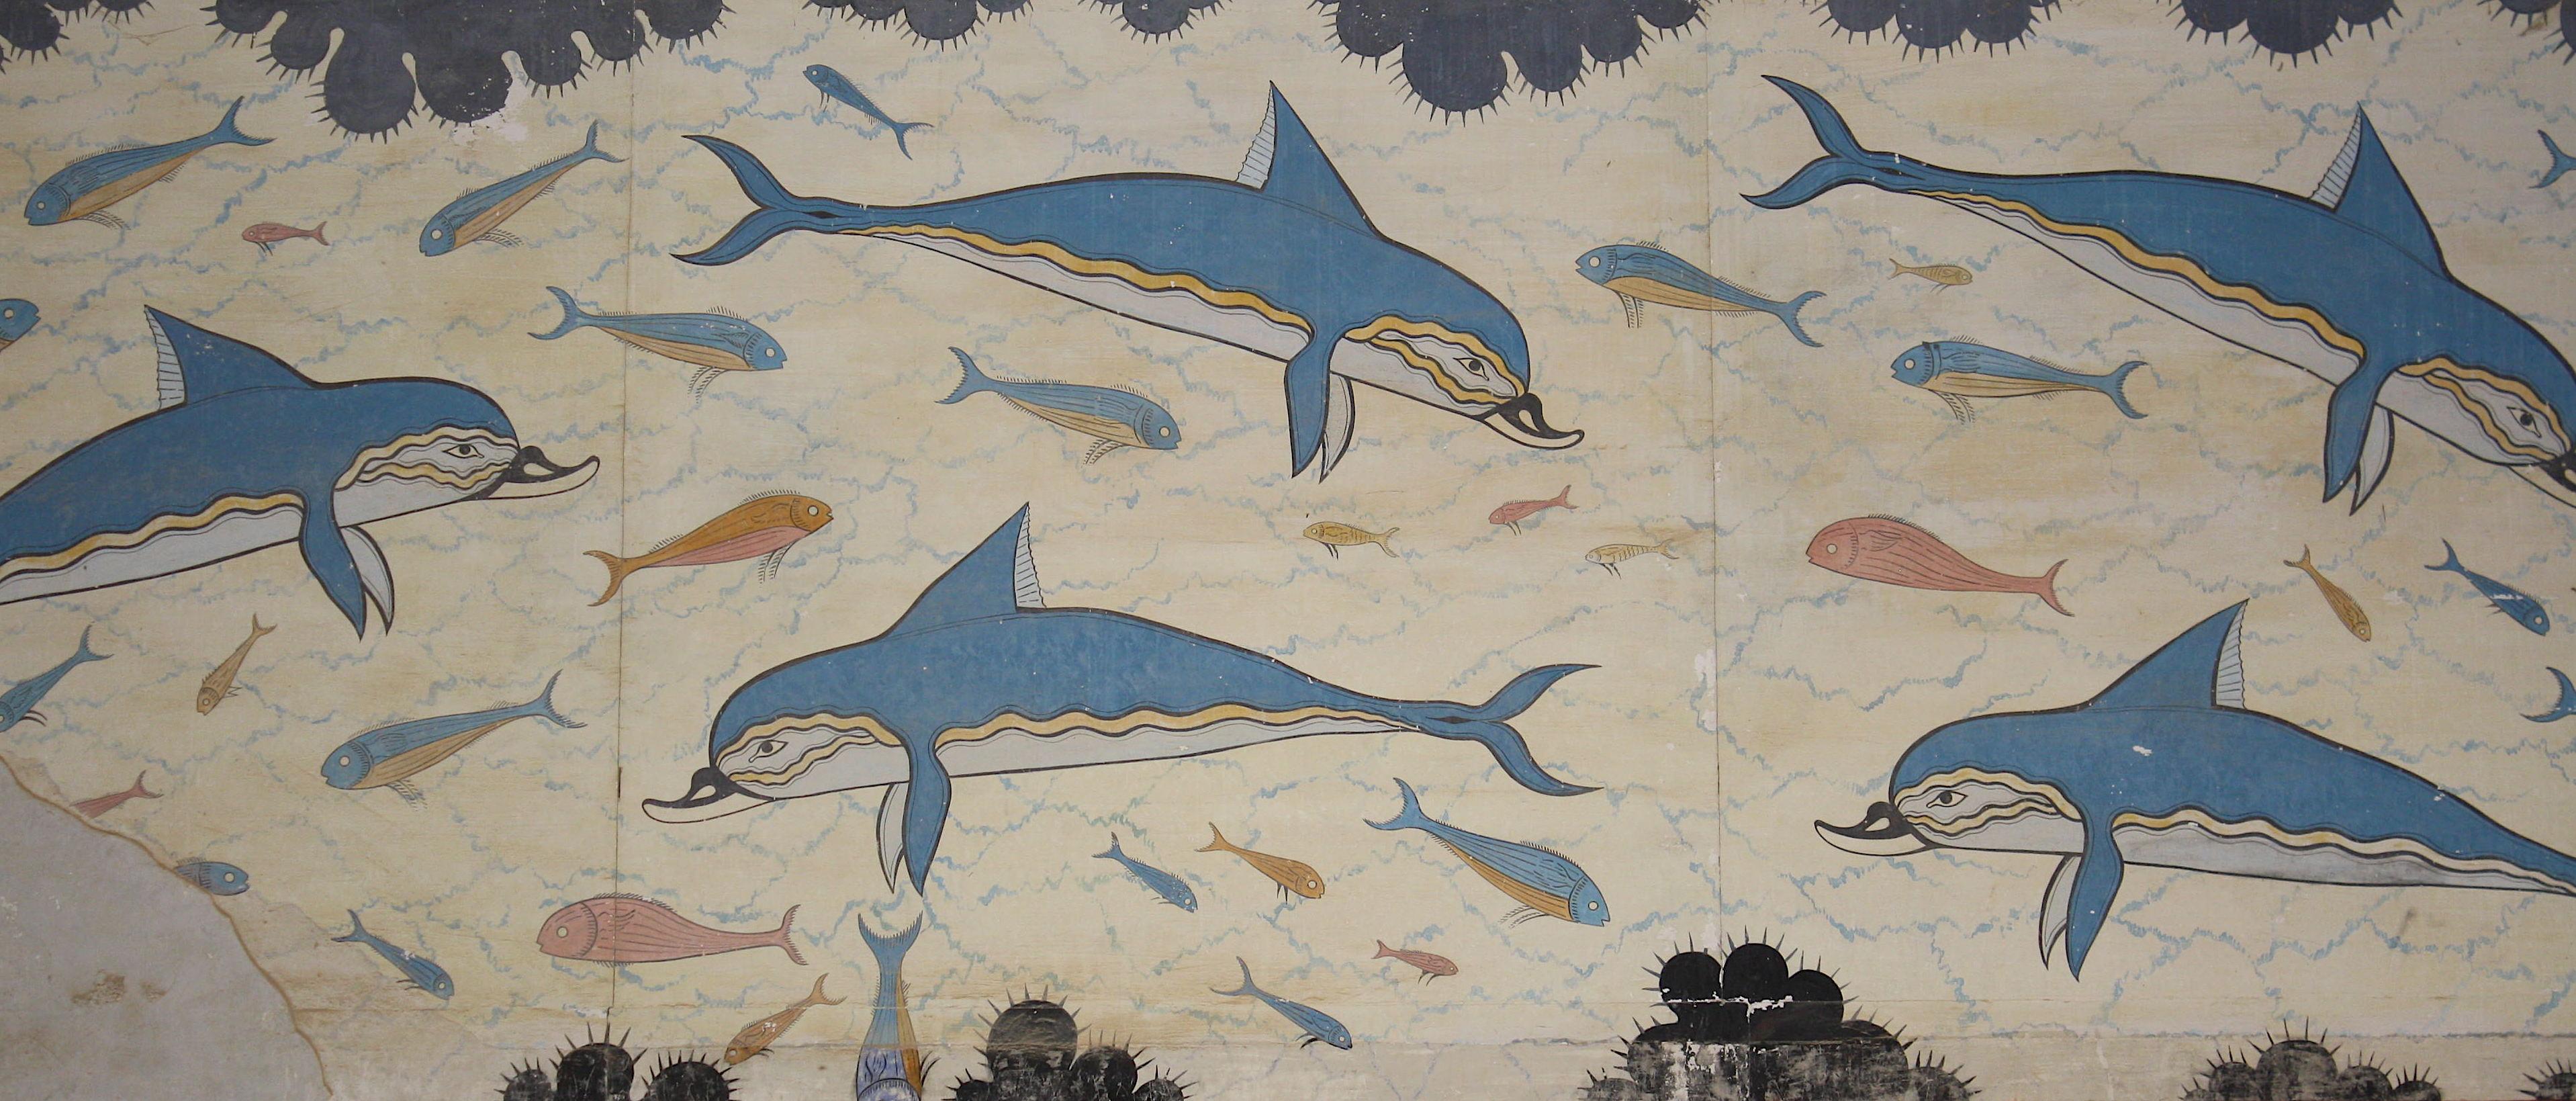 Dolphin fresco knossos crete illustration ancient for Dolphin mural knossos